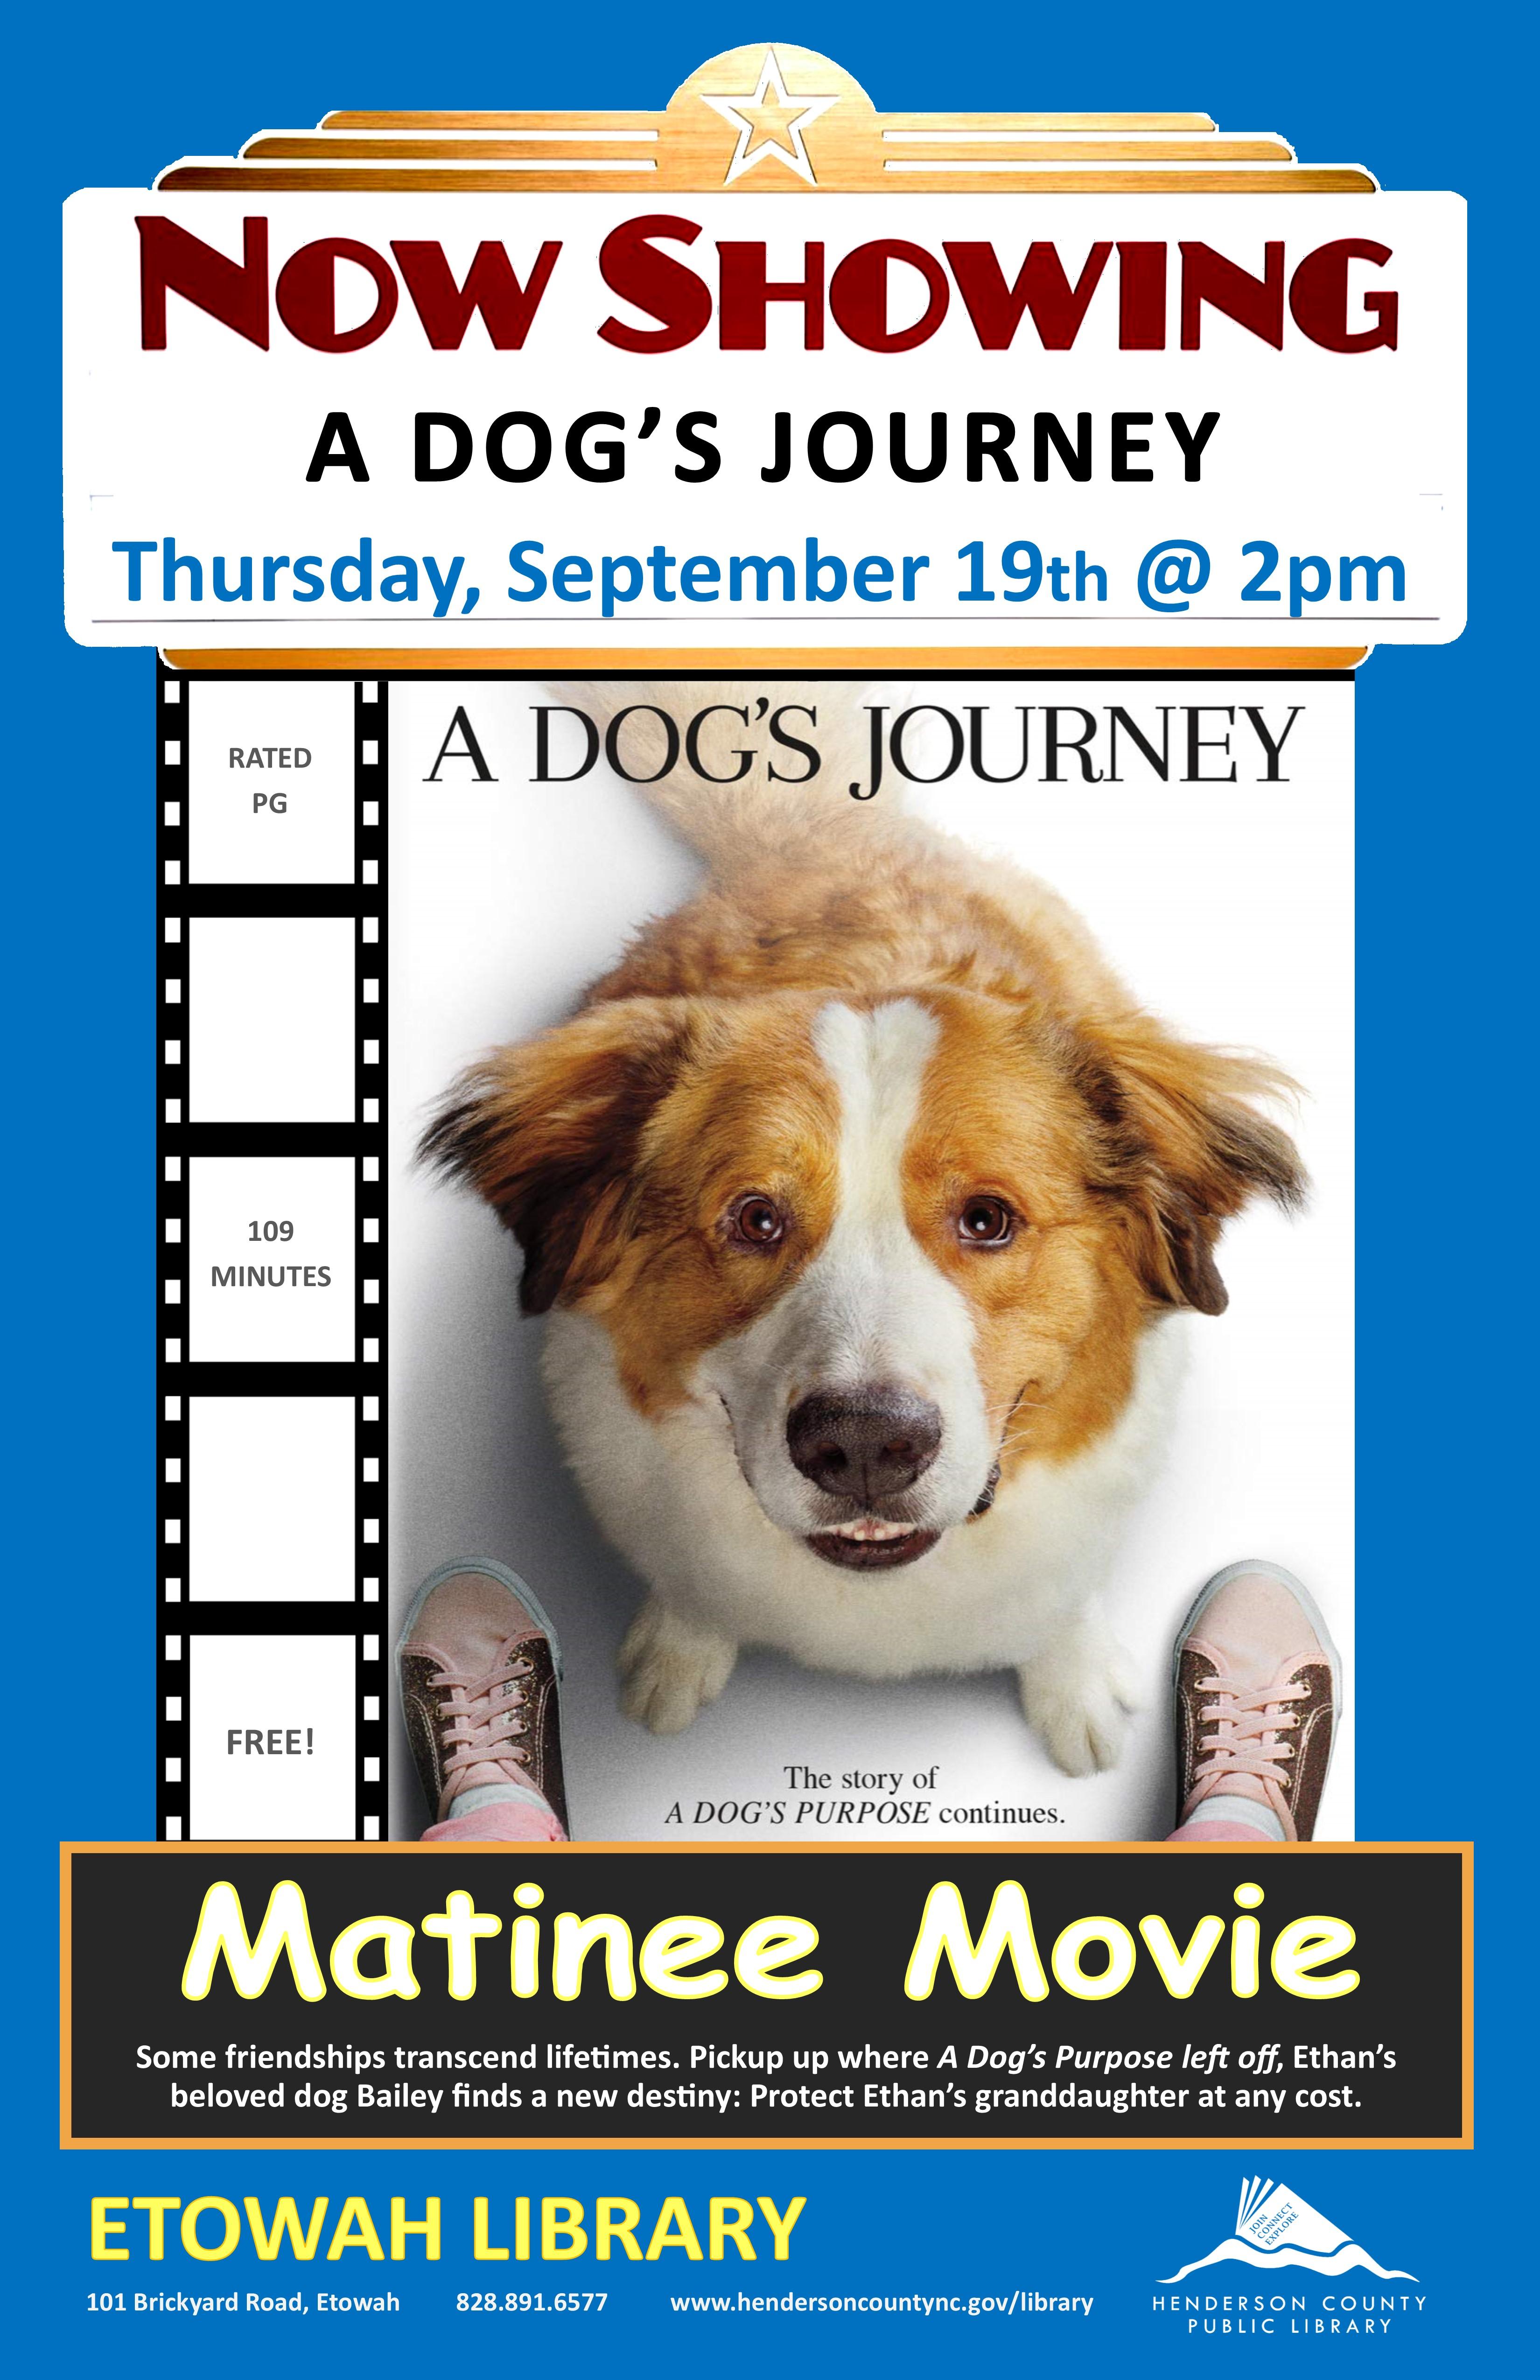 Matinee Movie @ Etowah: A Dog's Journey